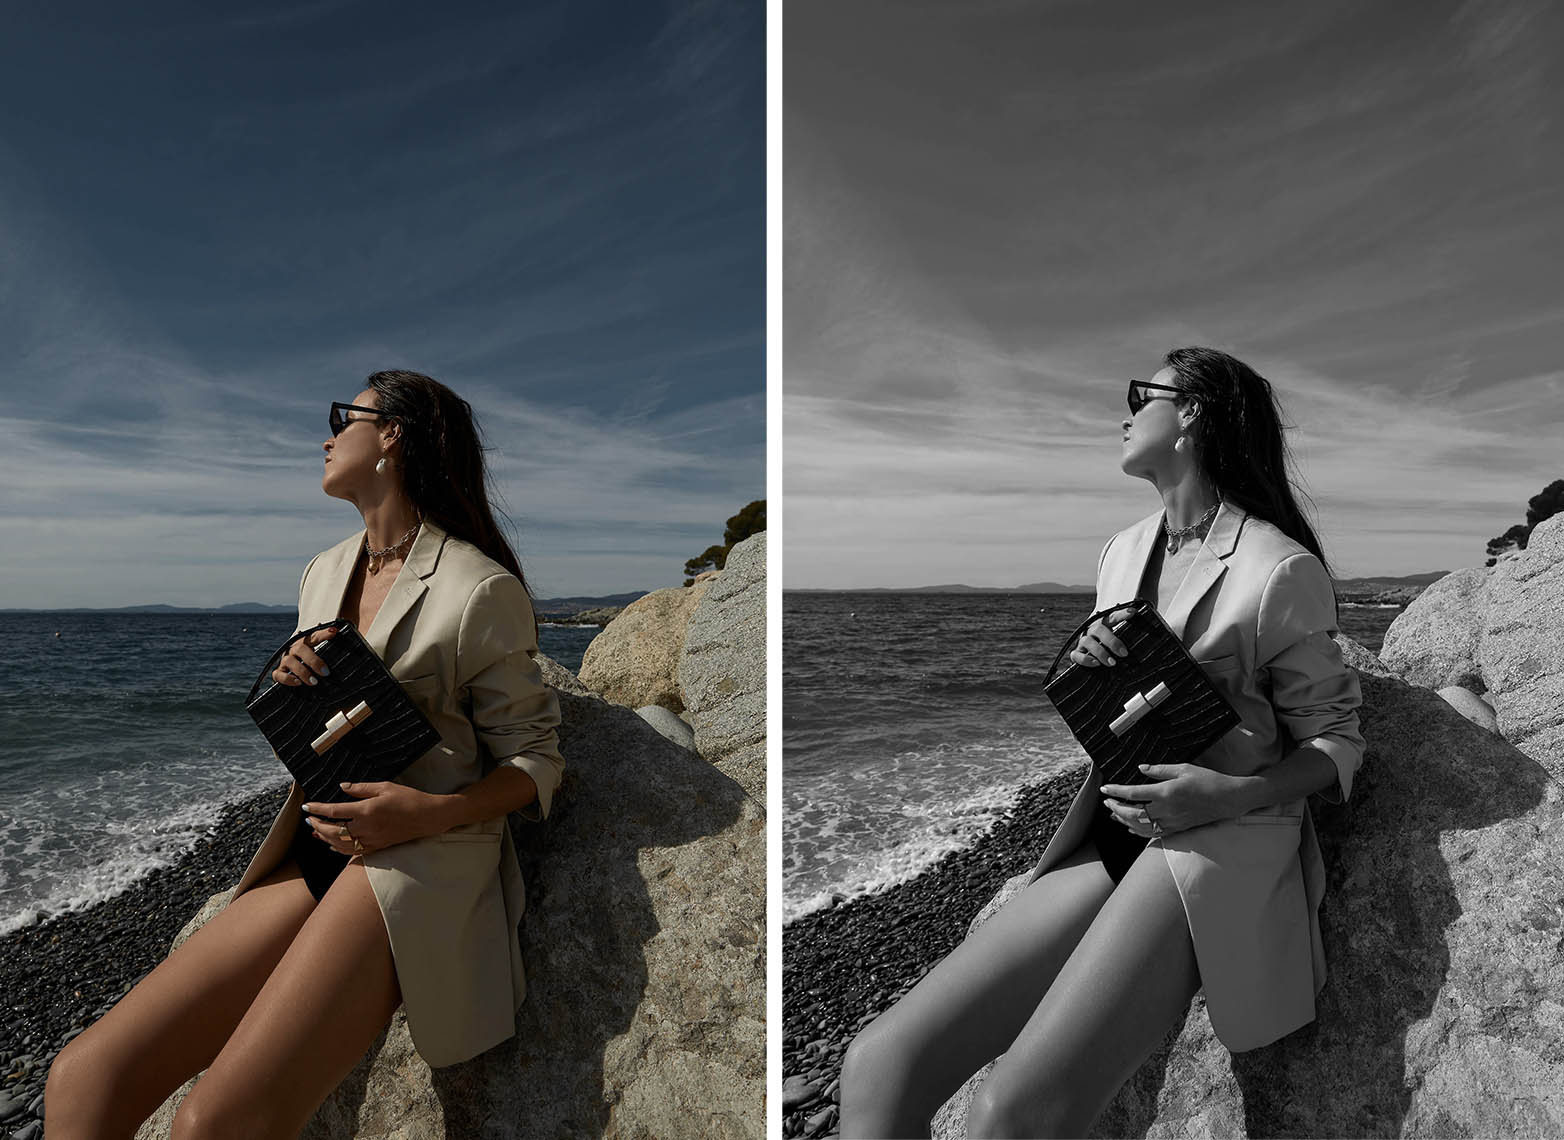 Bottega, Veneta, Quilted, Heel, Box, Bag, Oracle Fox, France, Editorial, Amanda, Shadforth, Matches, Fashion